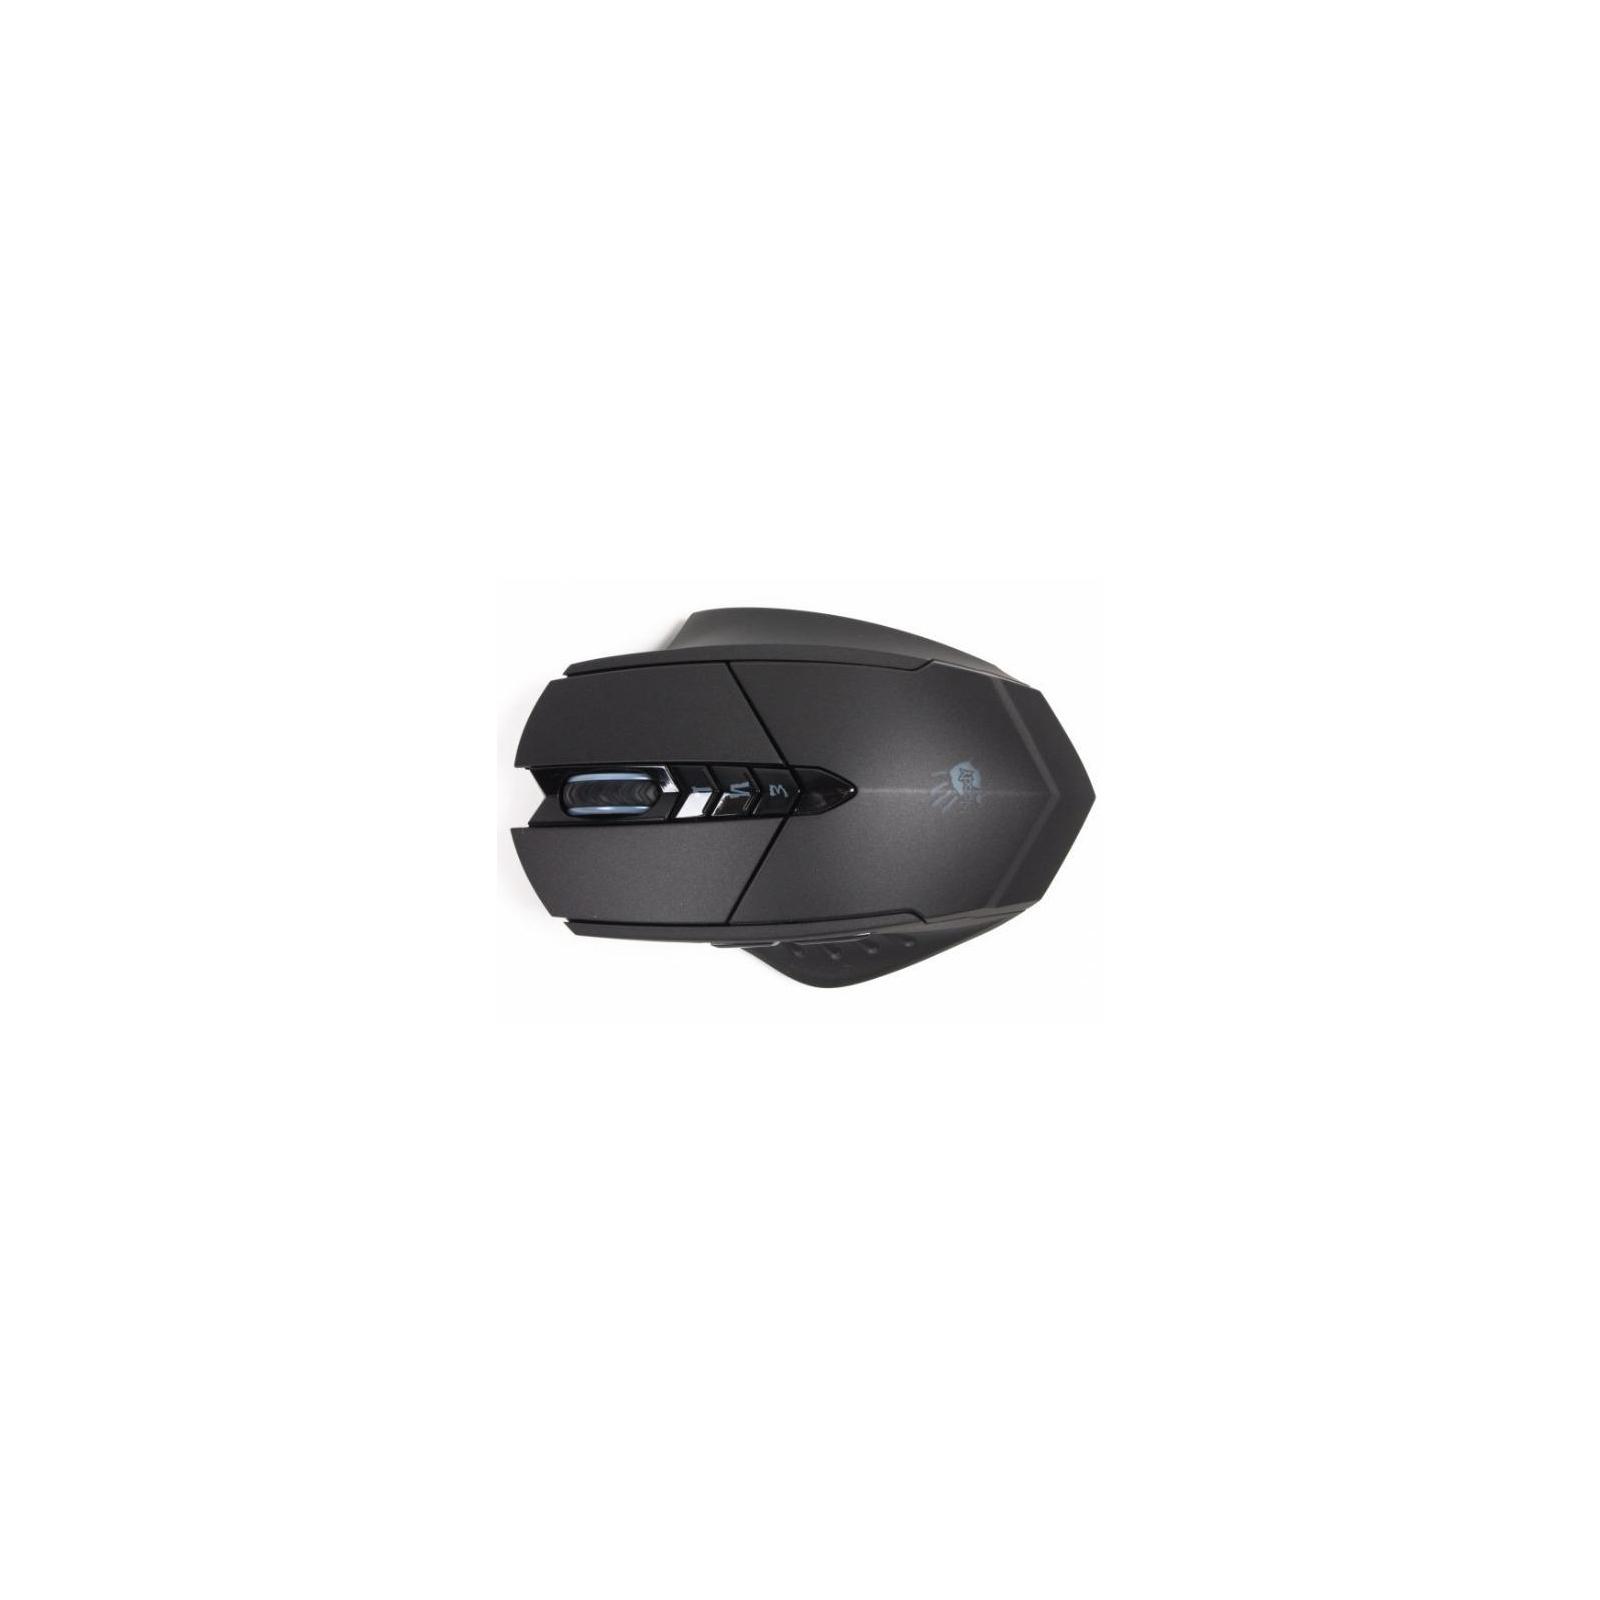 Мышка A4tech Bloody R70A Black изображение 4